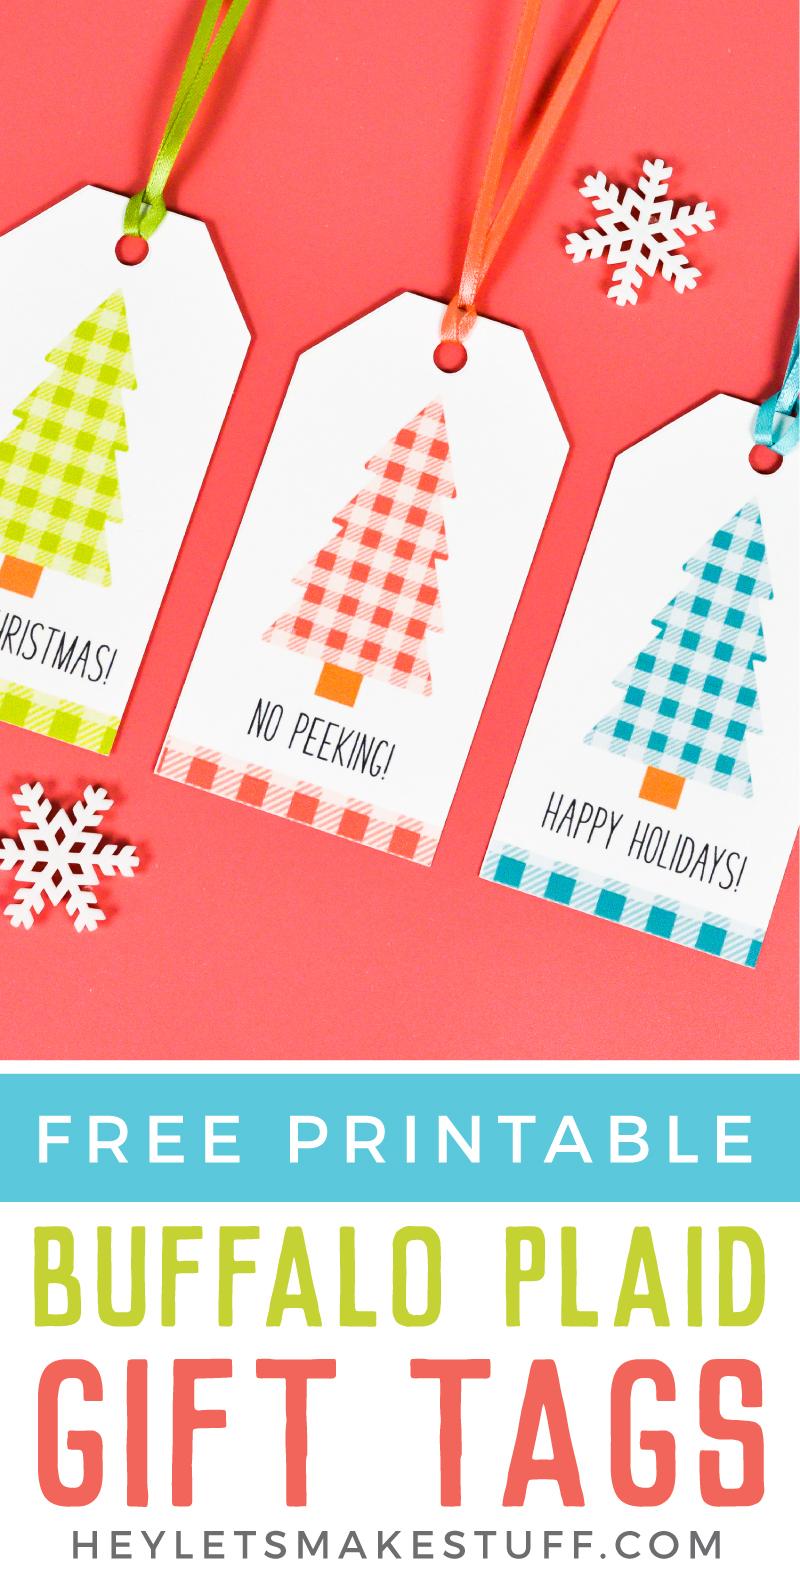 image relating to Printable Gift Tags Christmas identify Buffalo Plaid Printable Xmas Present Tags - Hey, Enables